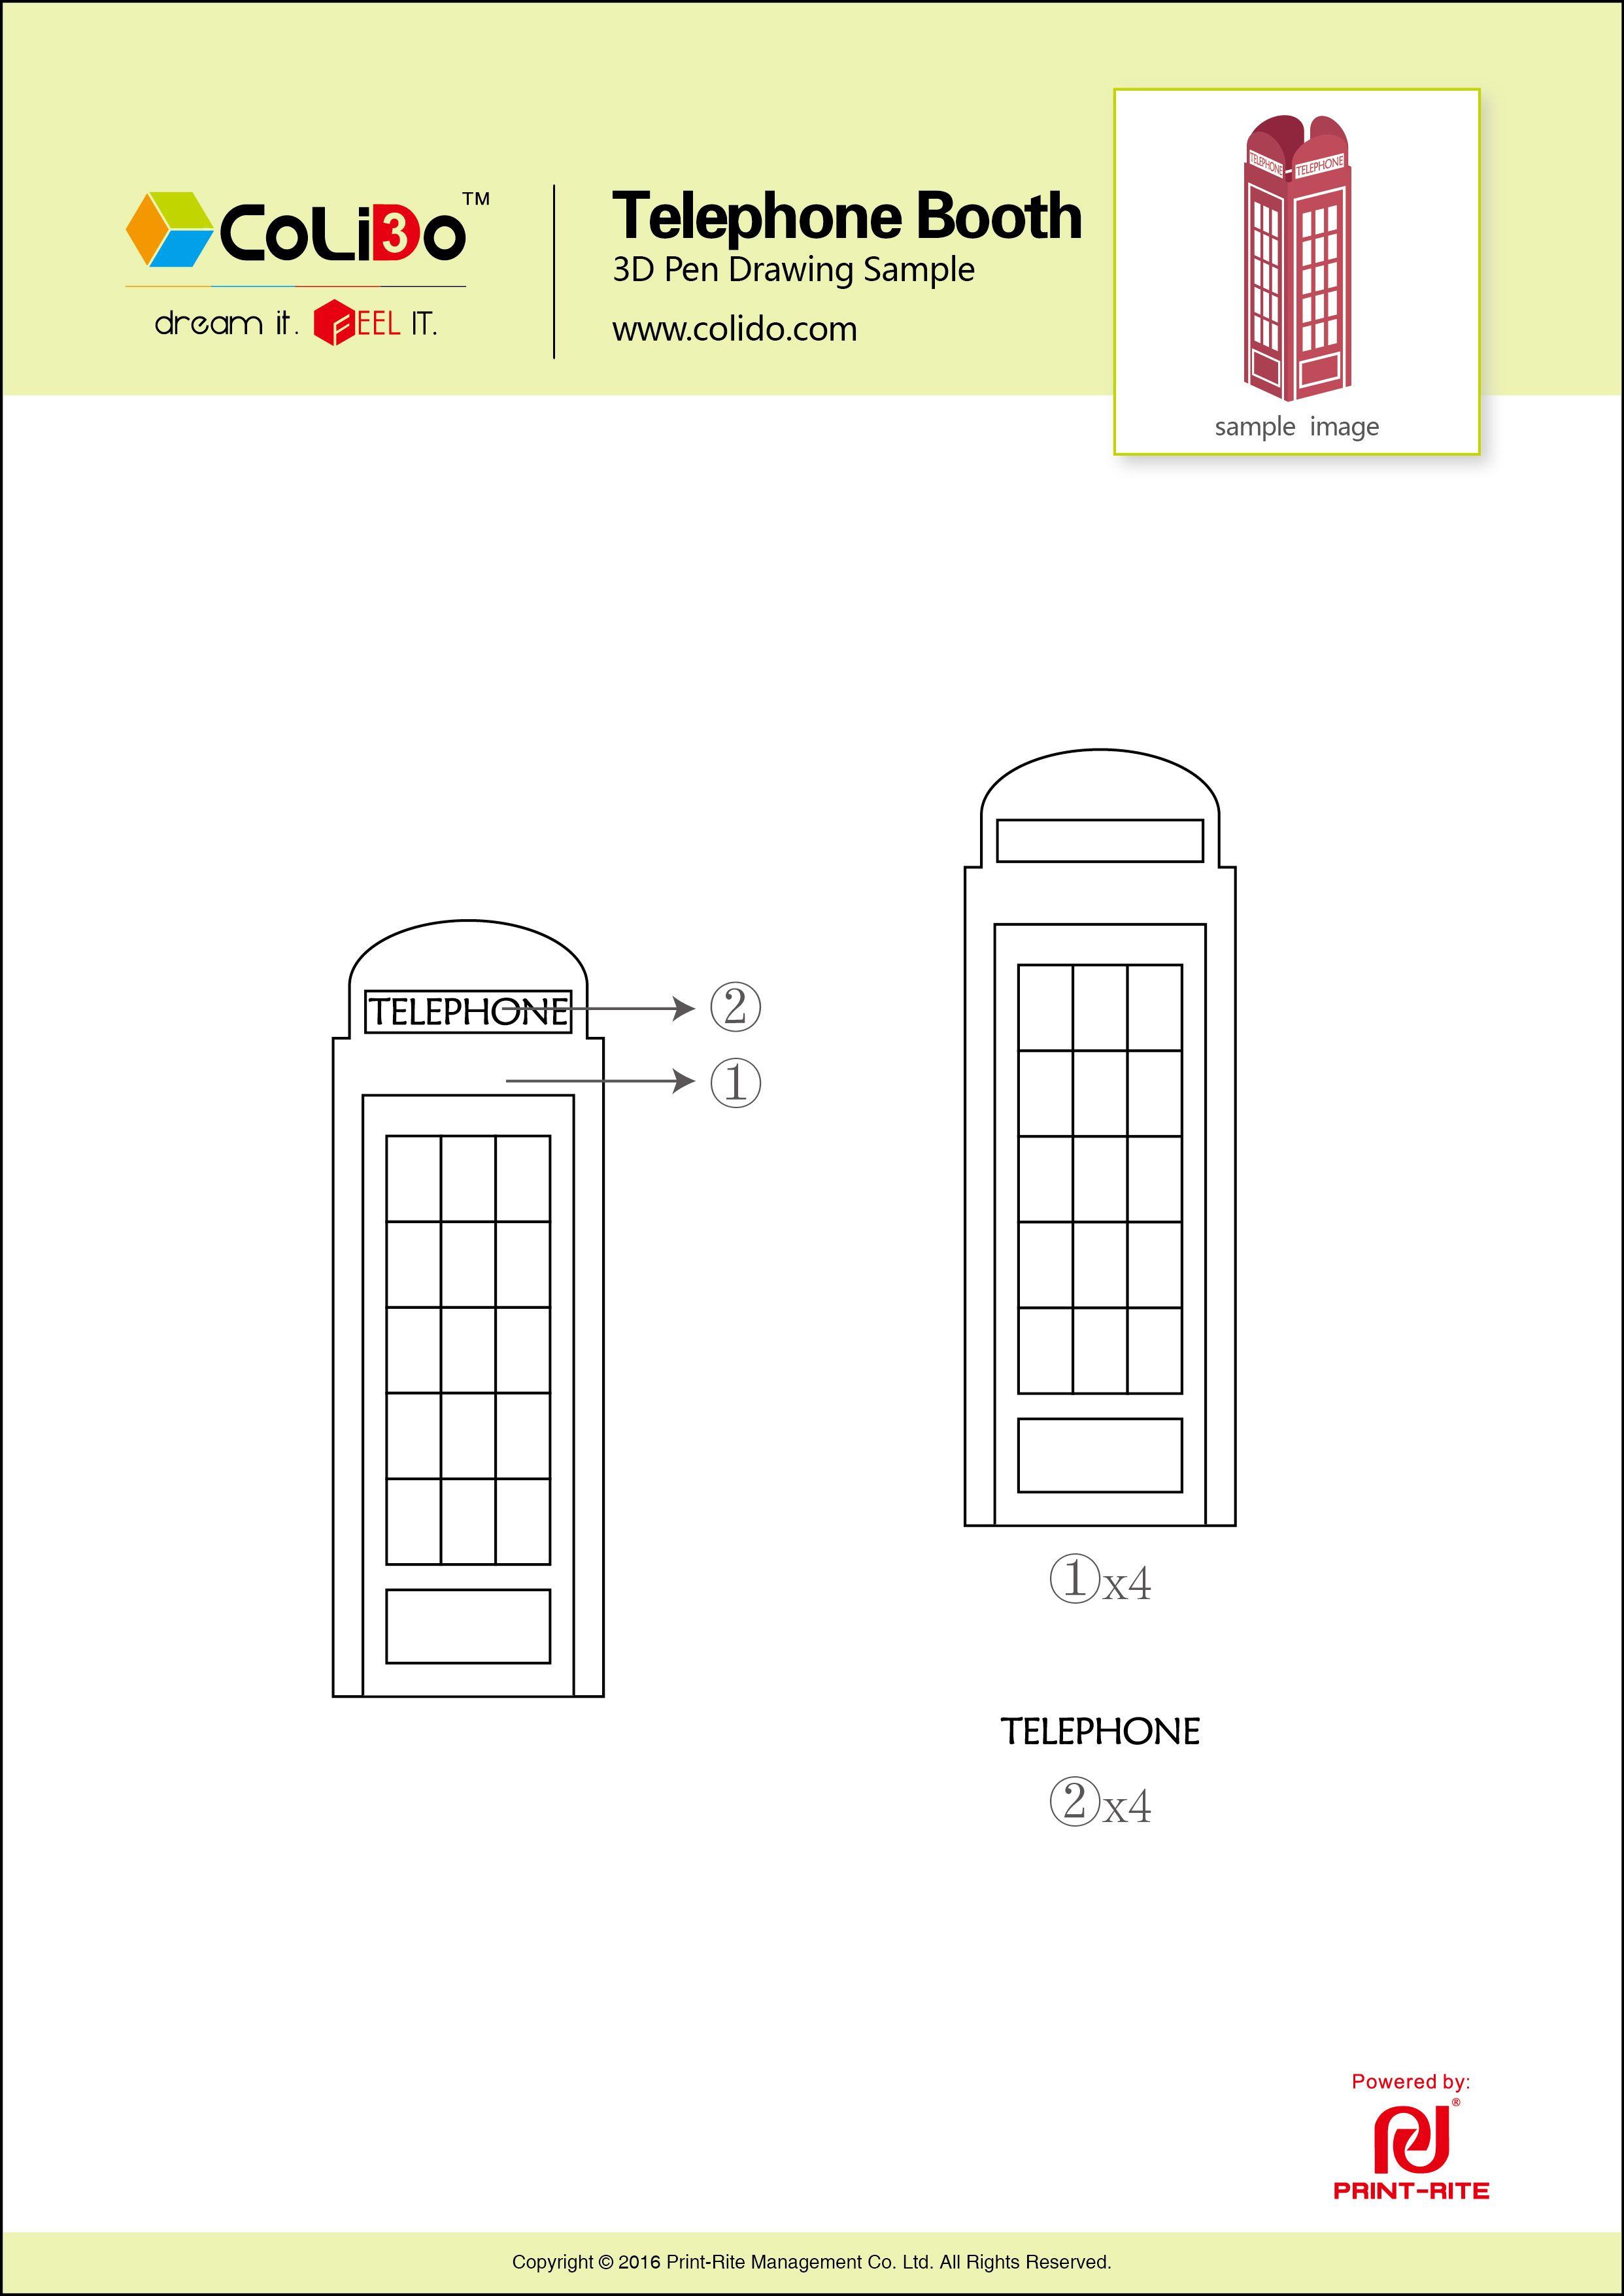 CoLiDo3dpenstenciltelephonebooth.jpg (JPEGGrafik